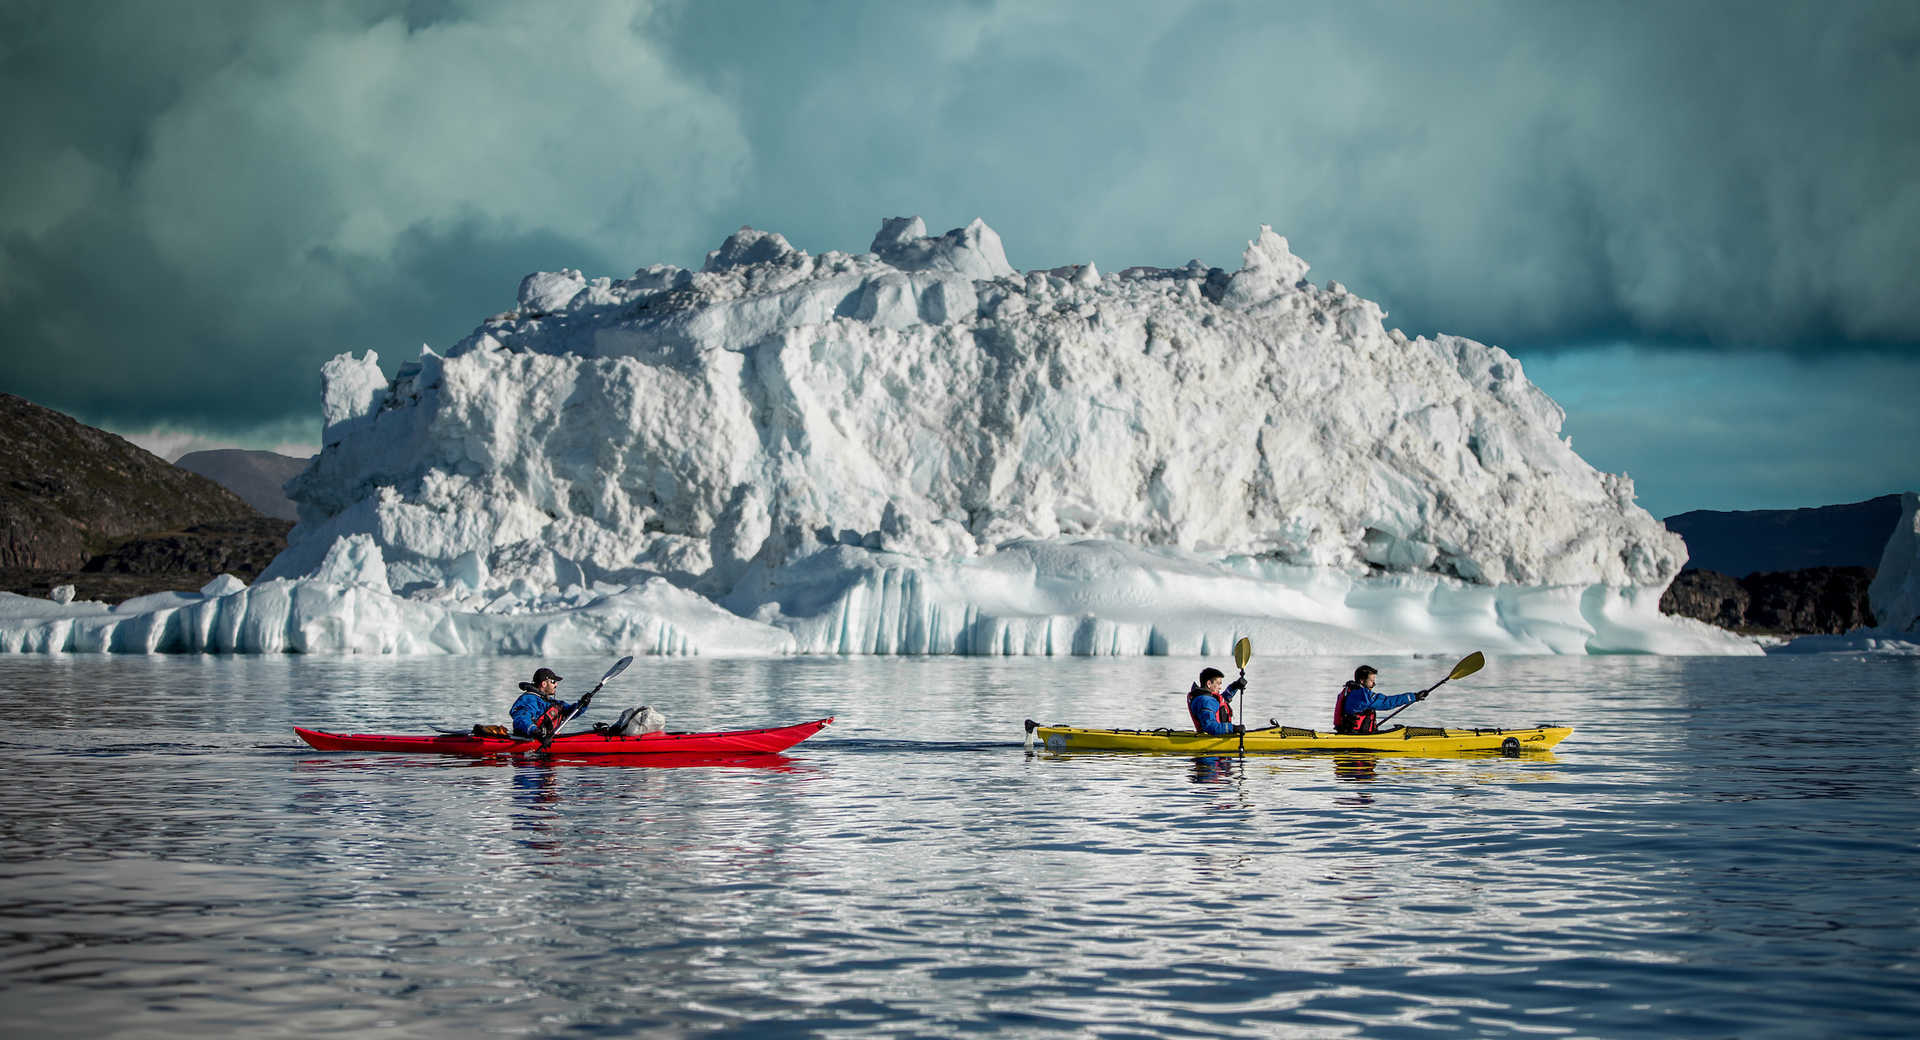 Voyage Groenland Rando Et Kayak Dans L Ouest Groenlandais Huwans